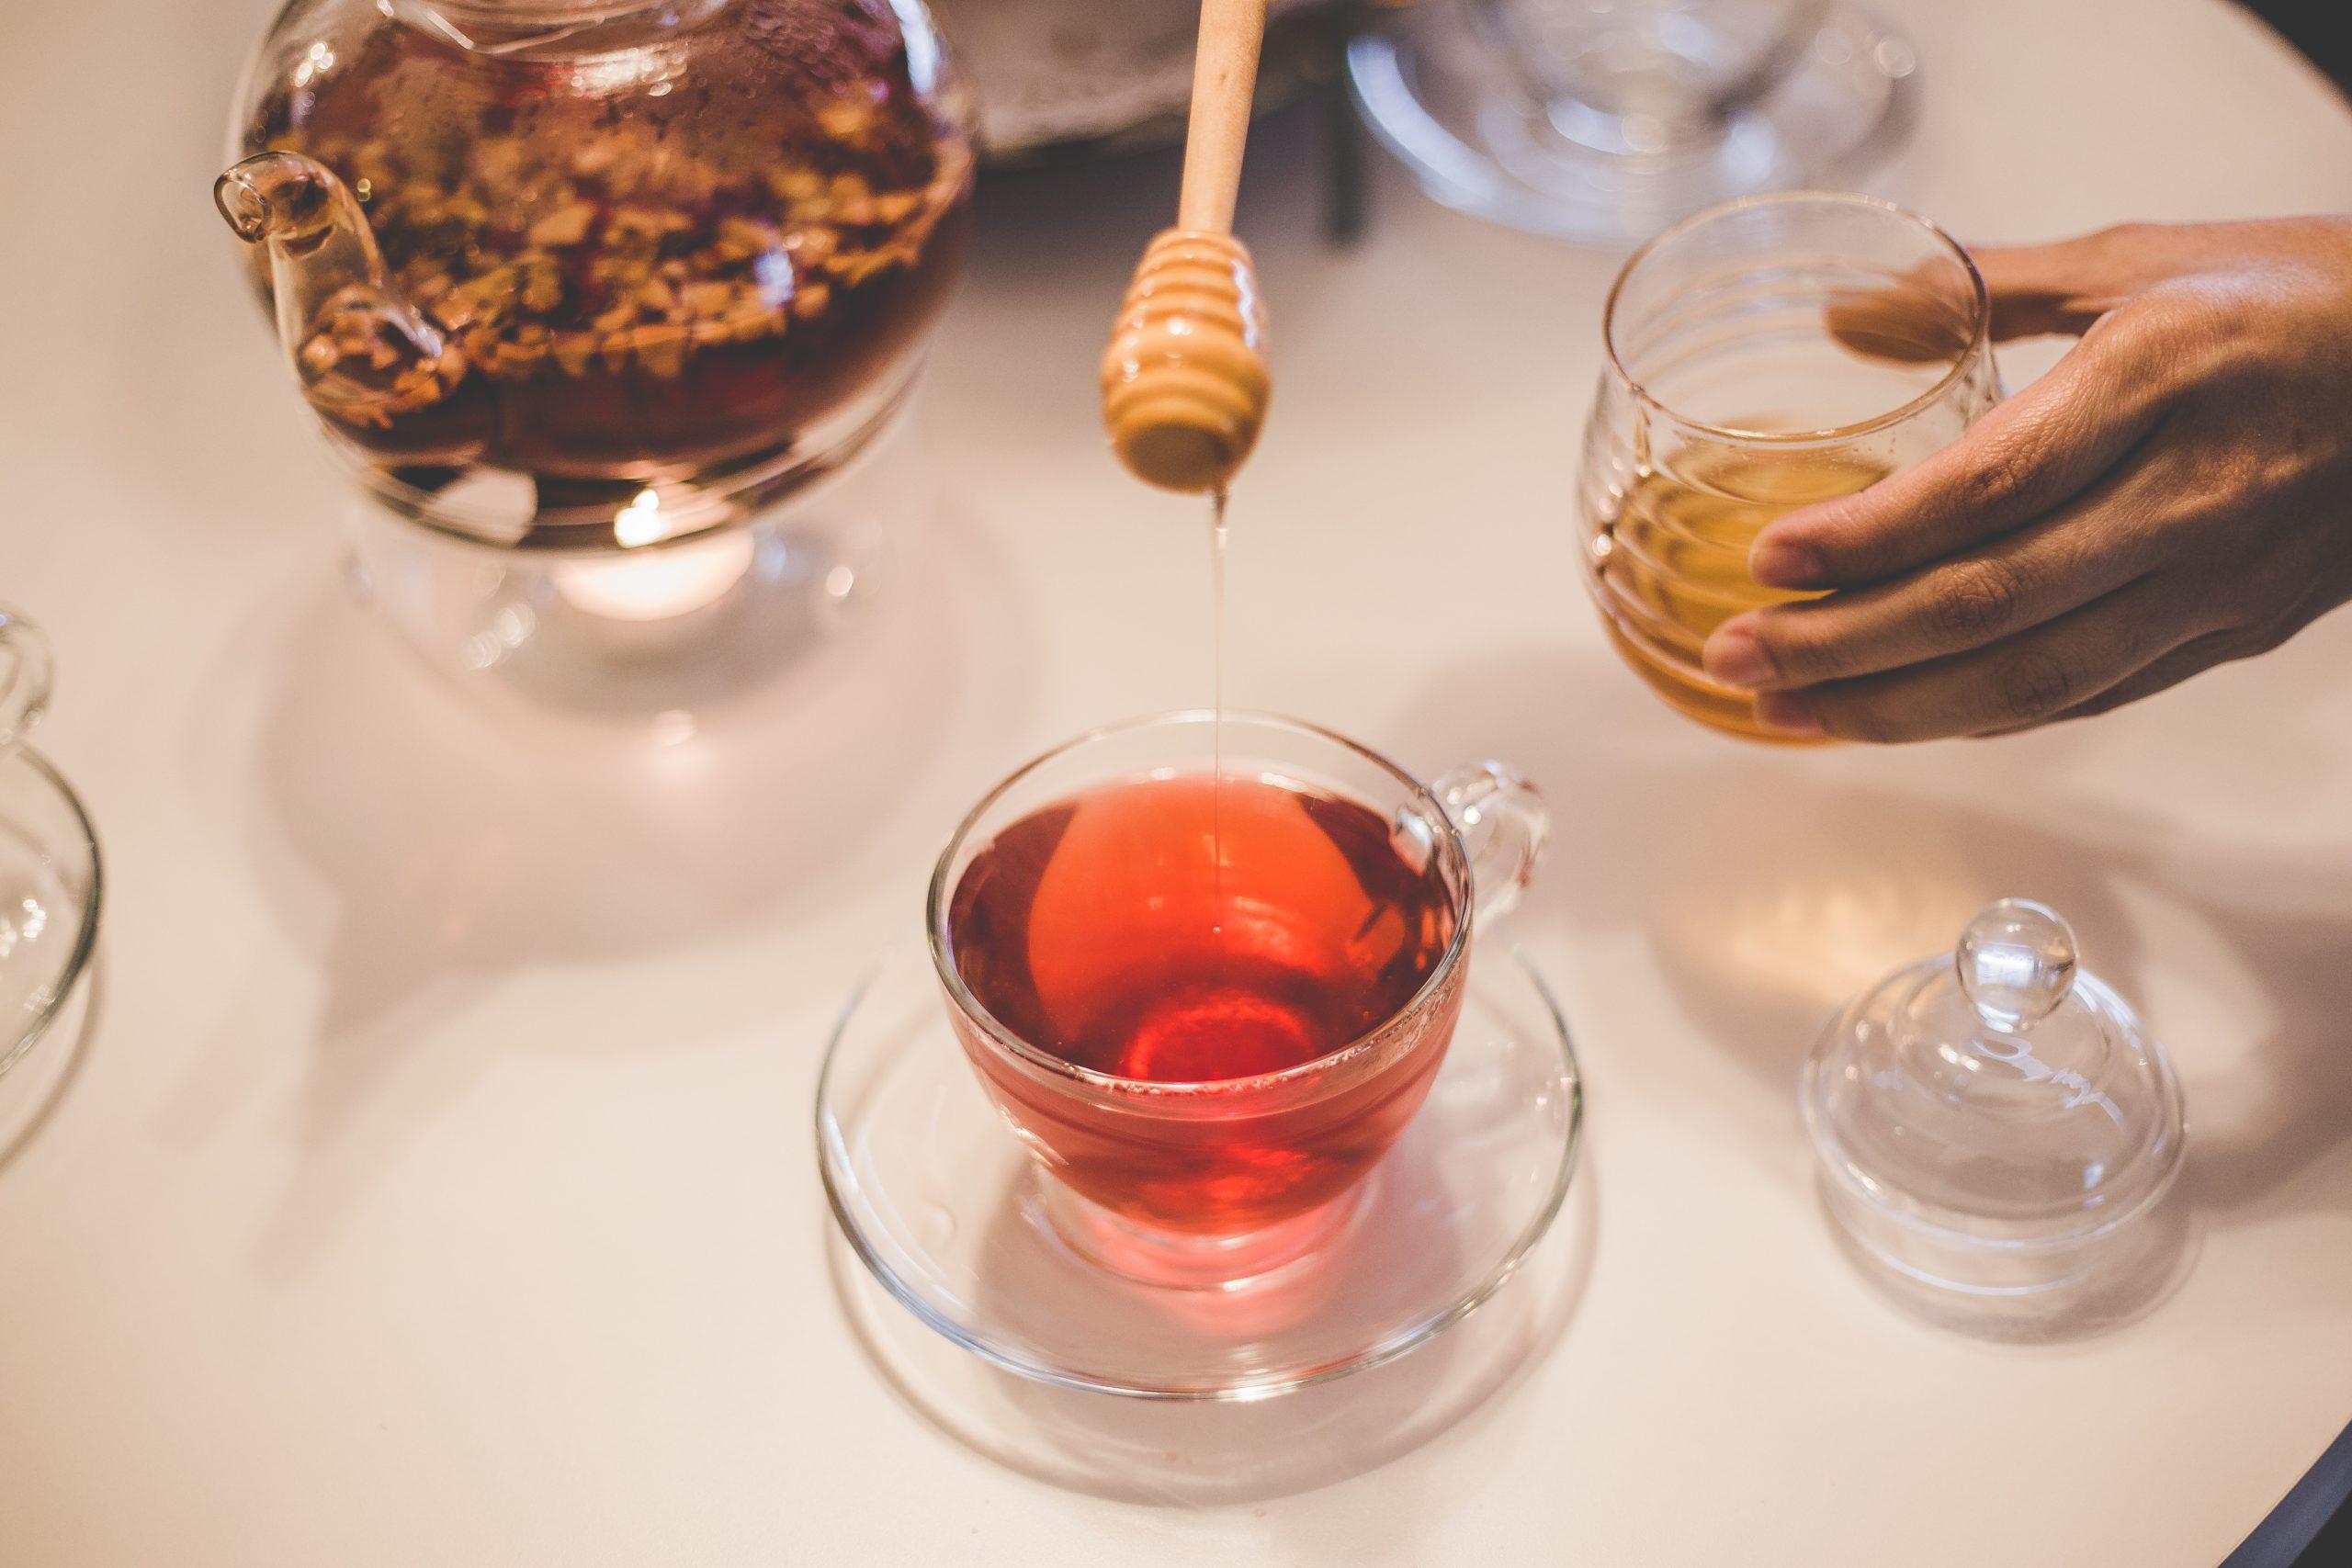 Honey Tea Cold Remedy - Photo by Angello Lopez on Unsplash